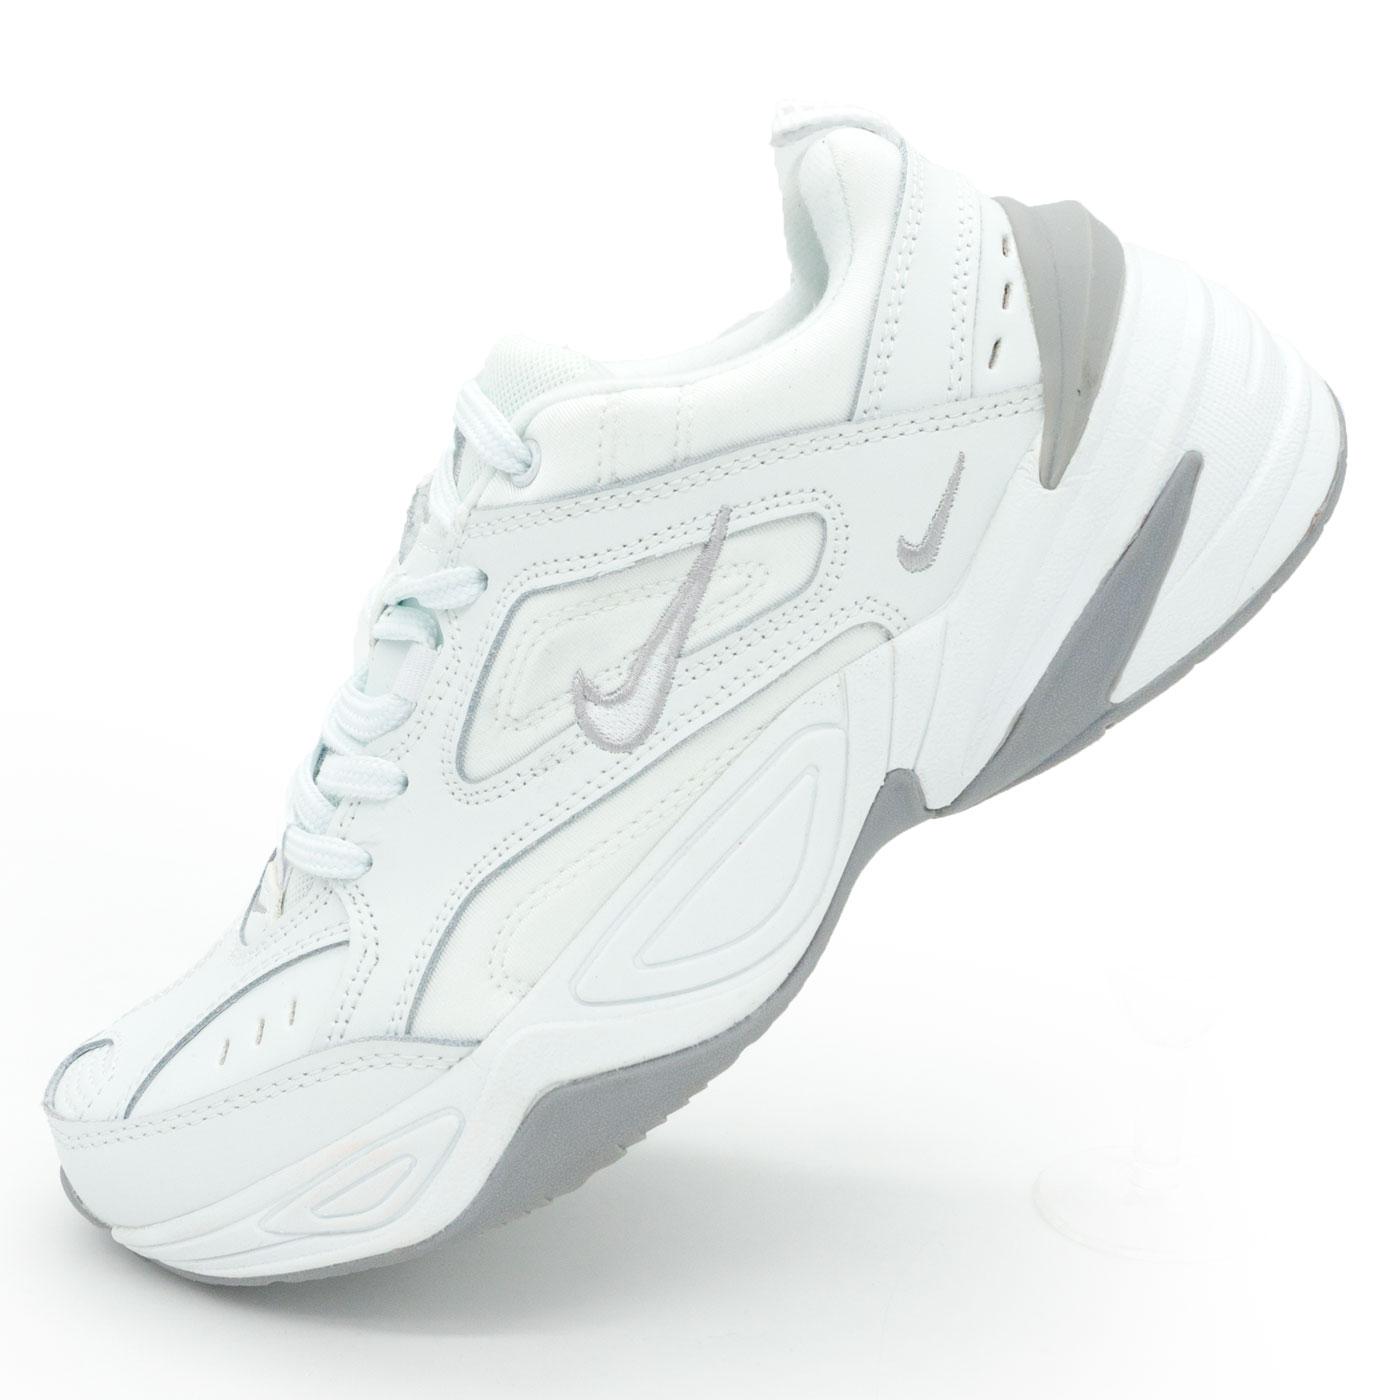 фото main Кроссовки Nike M2K Tekno полностью белые main